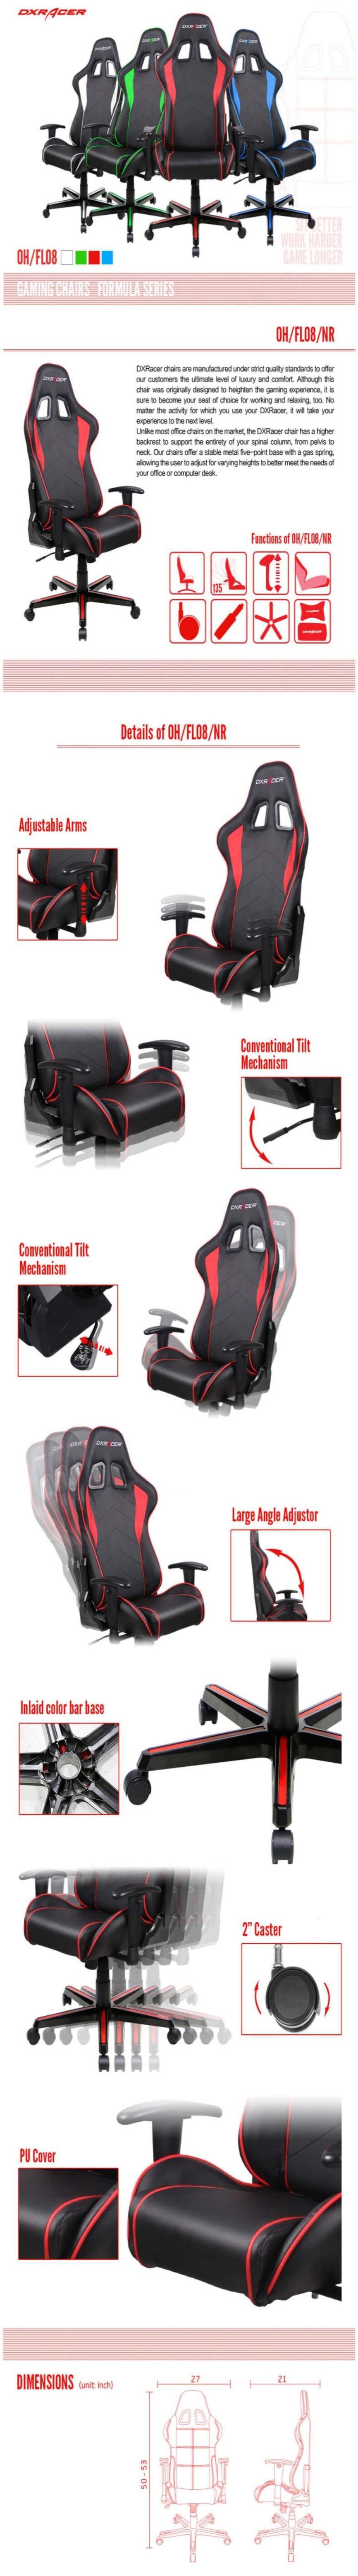 DXRacer Formula FL08 Black & Red Neck/Lumbar Gaming/Office/Ergonomic Chair